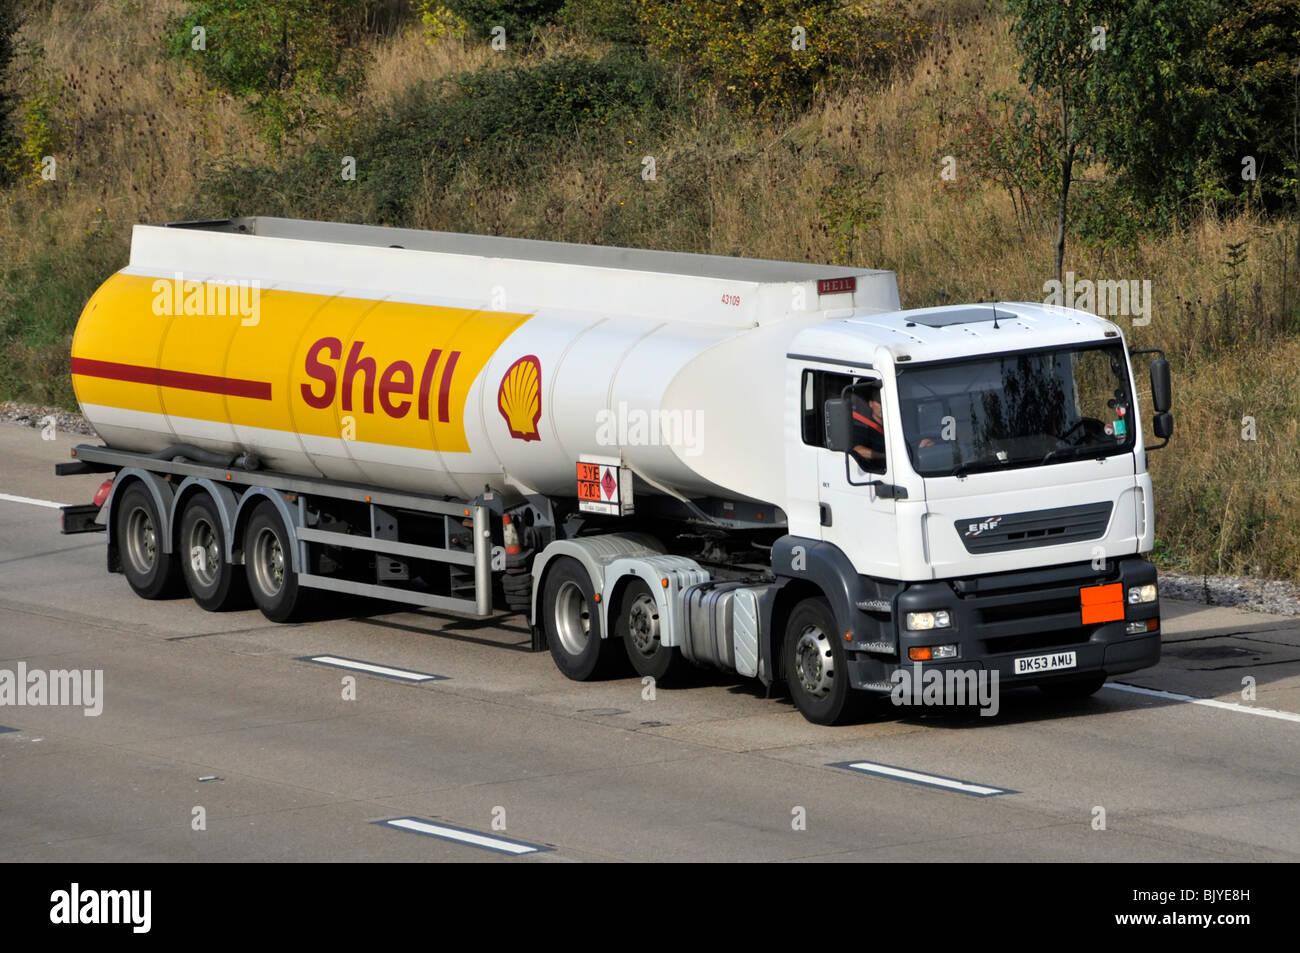 Autopista M25 Shell fer neumáticos de camiones cisterna de combustible ahorro eje levantado Hazchem químicos Imagen De Stock